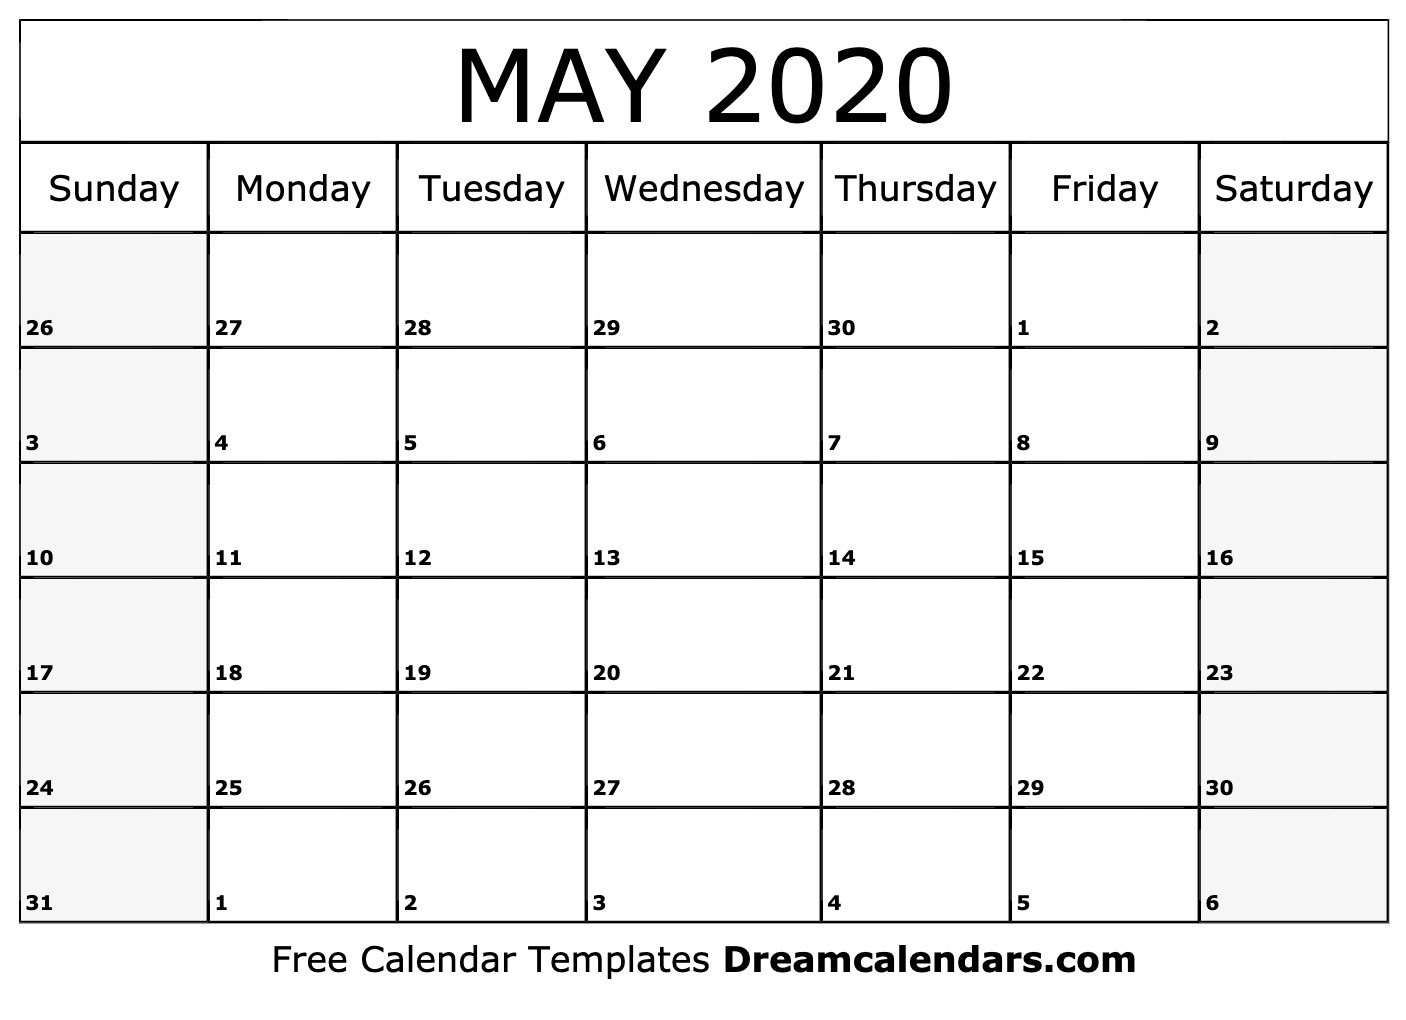 Free May 2020 Printable Calendar | Dream Calendars